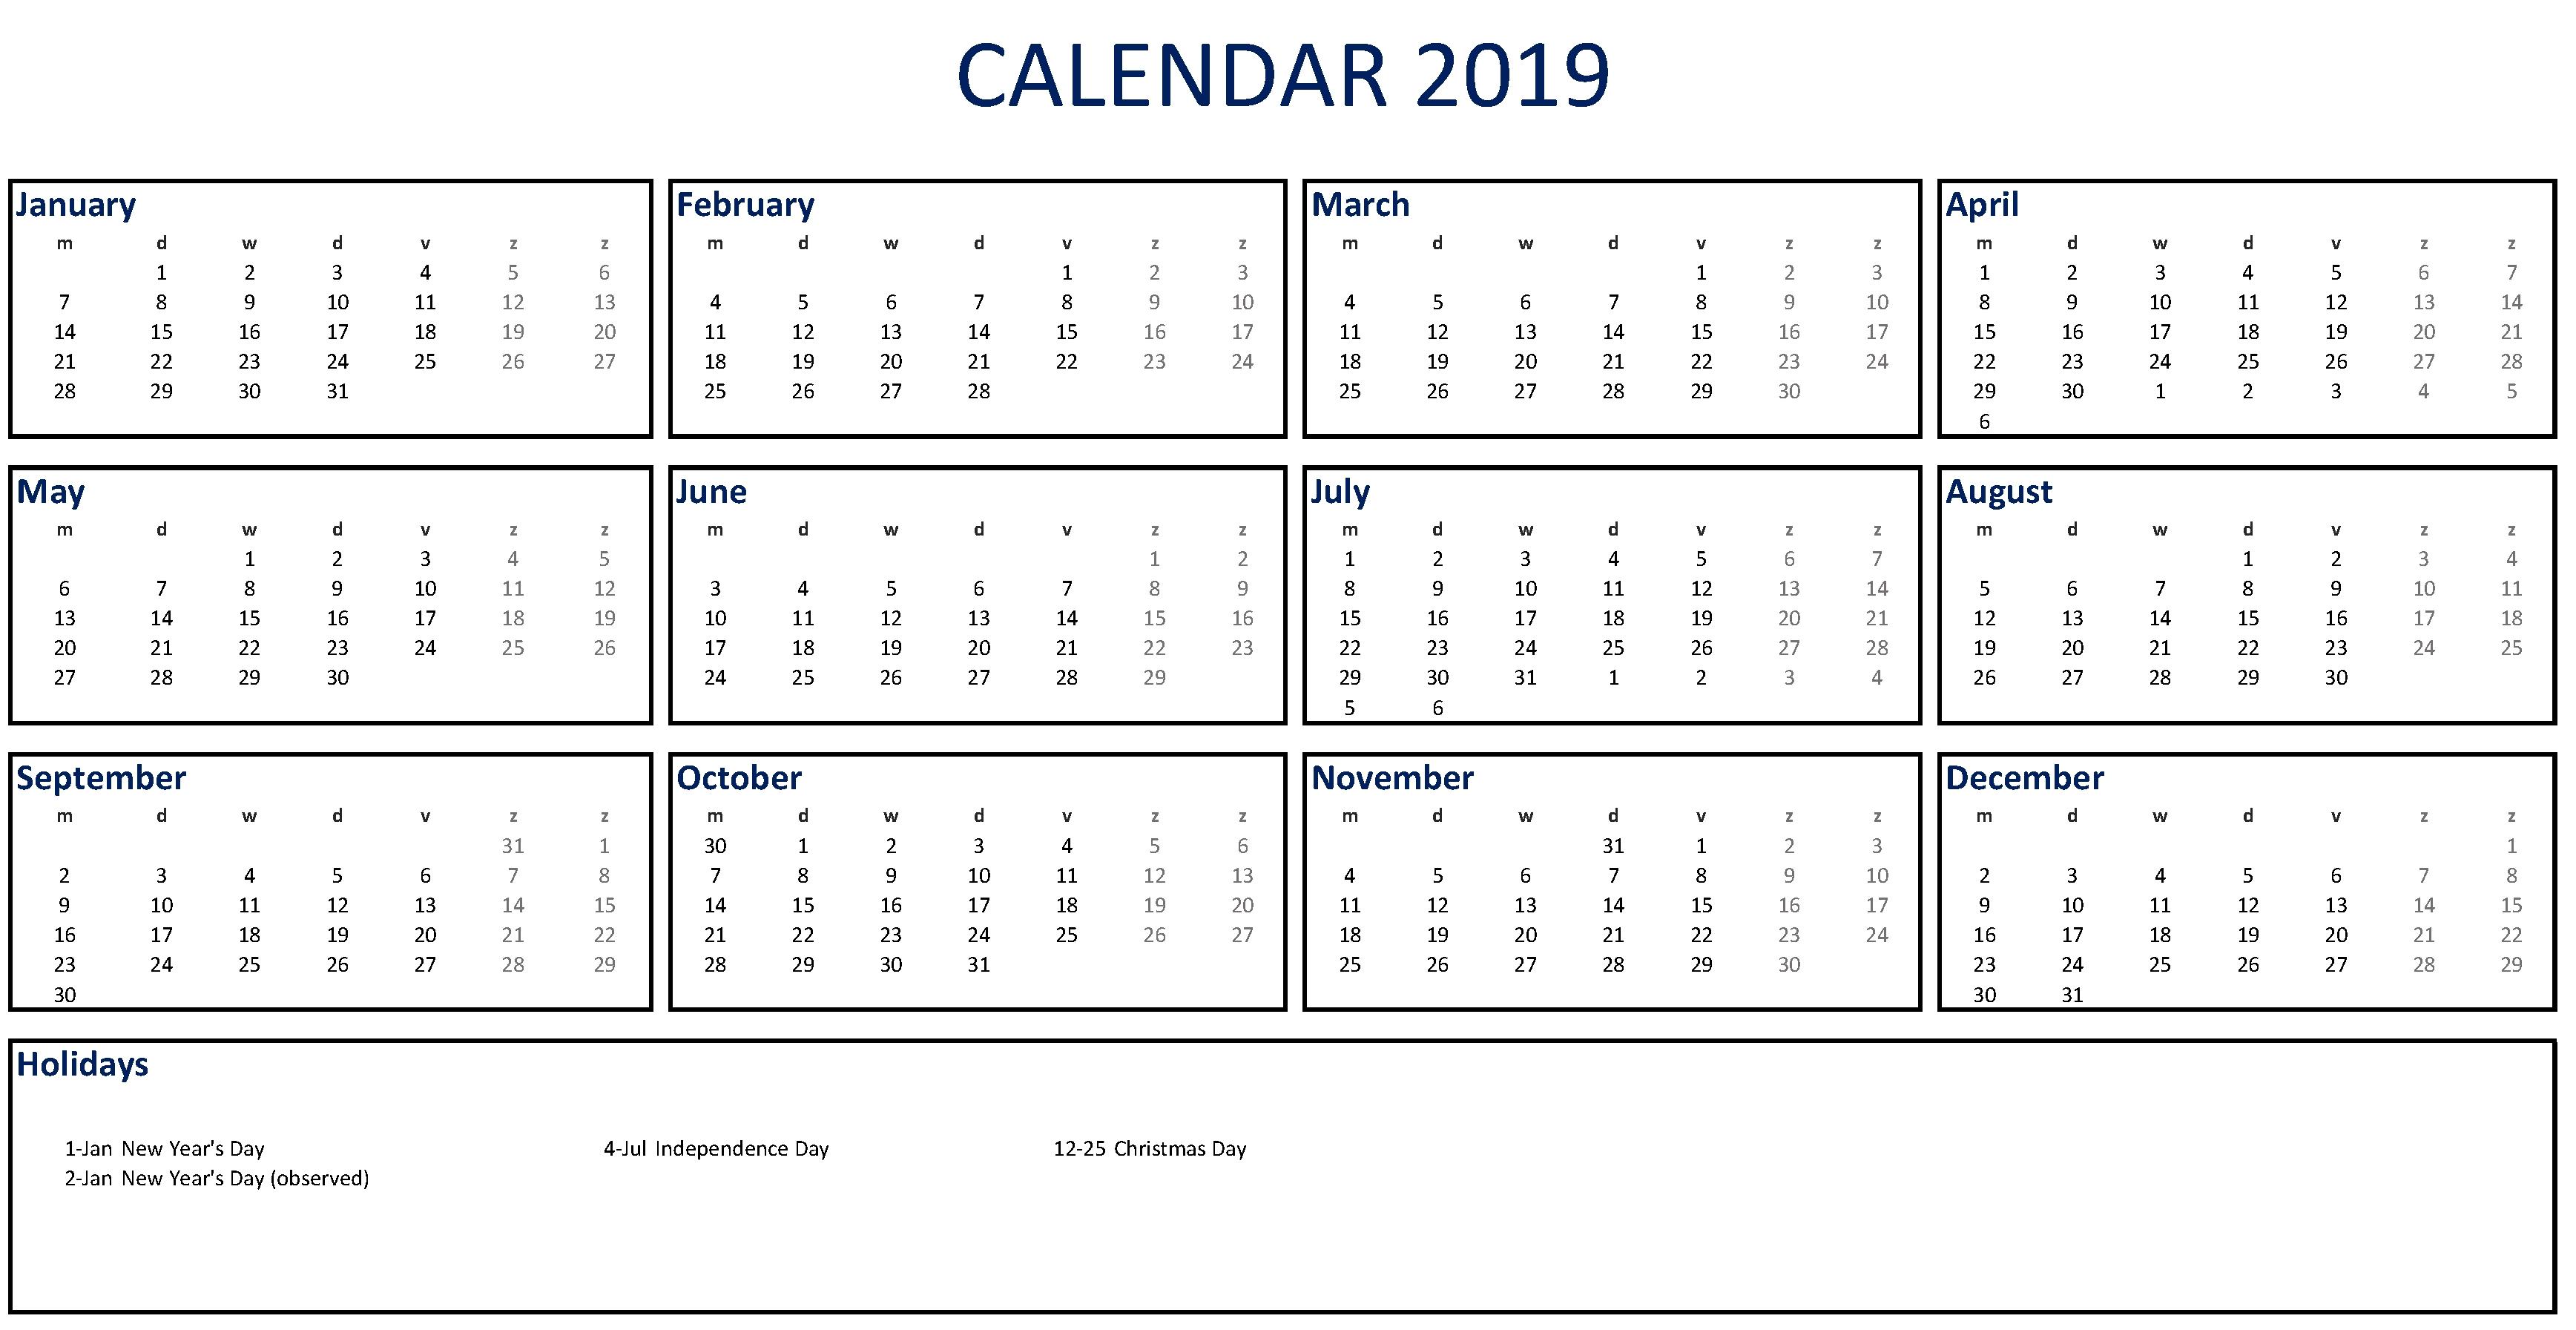 Free Printable 2019 Calendar Excel | Templates At Calendar Zoom 2019